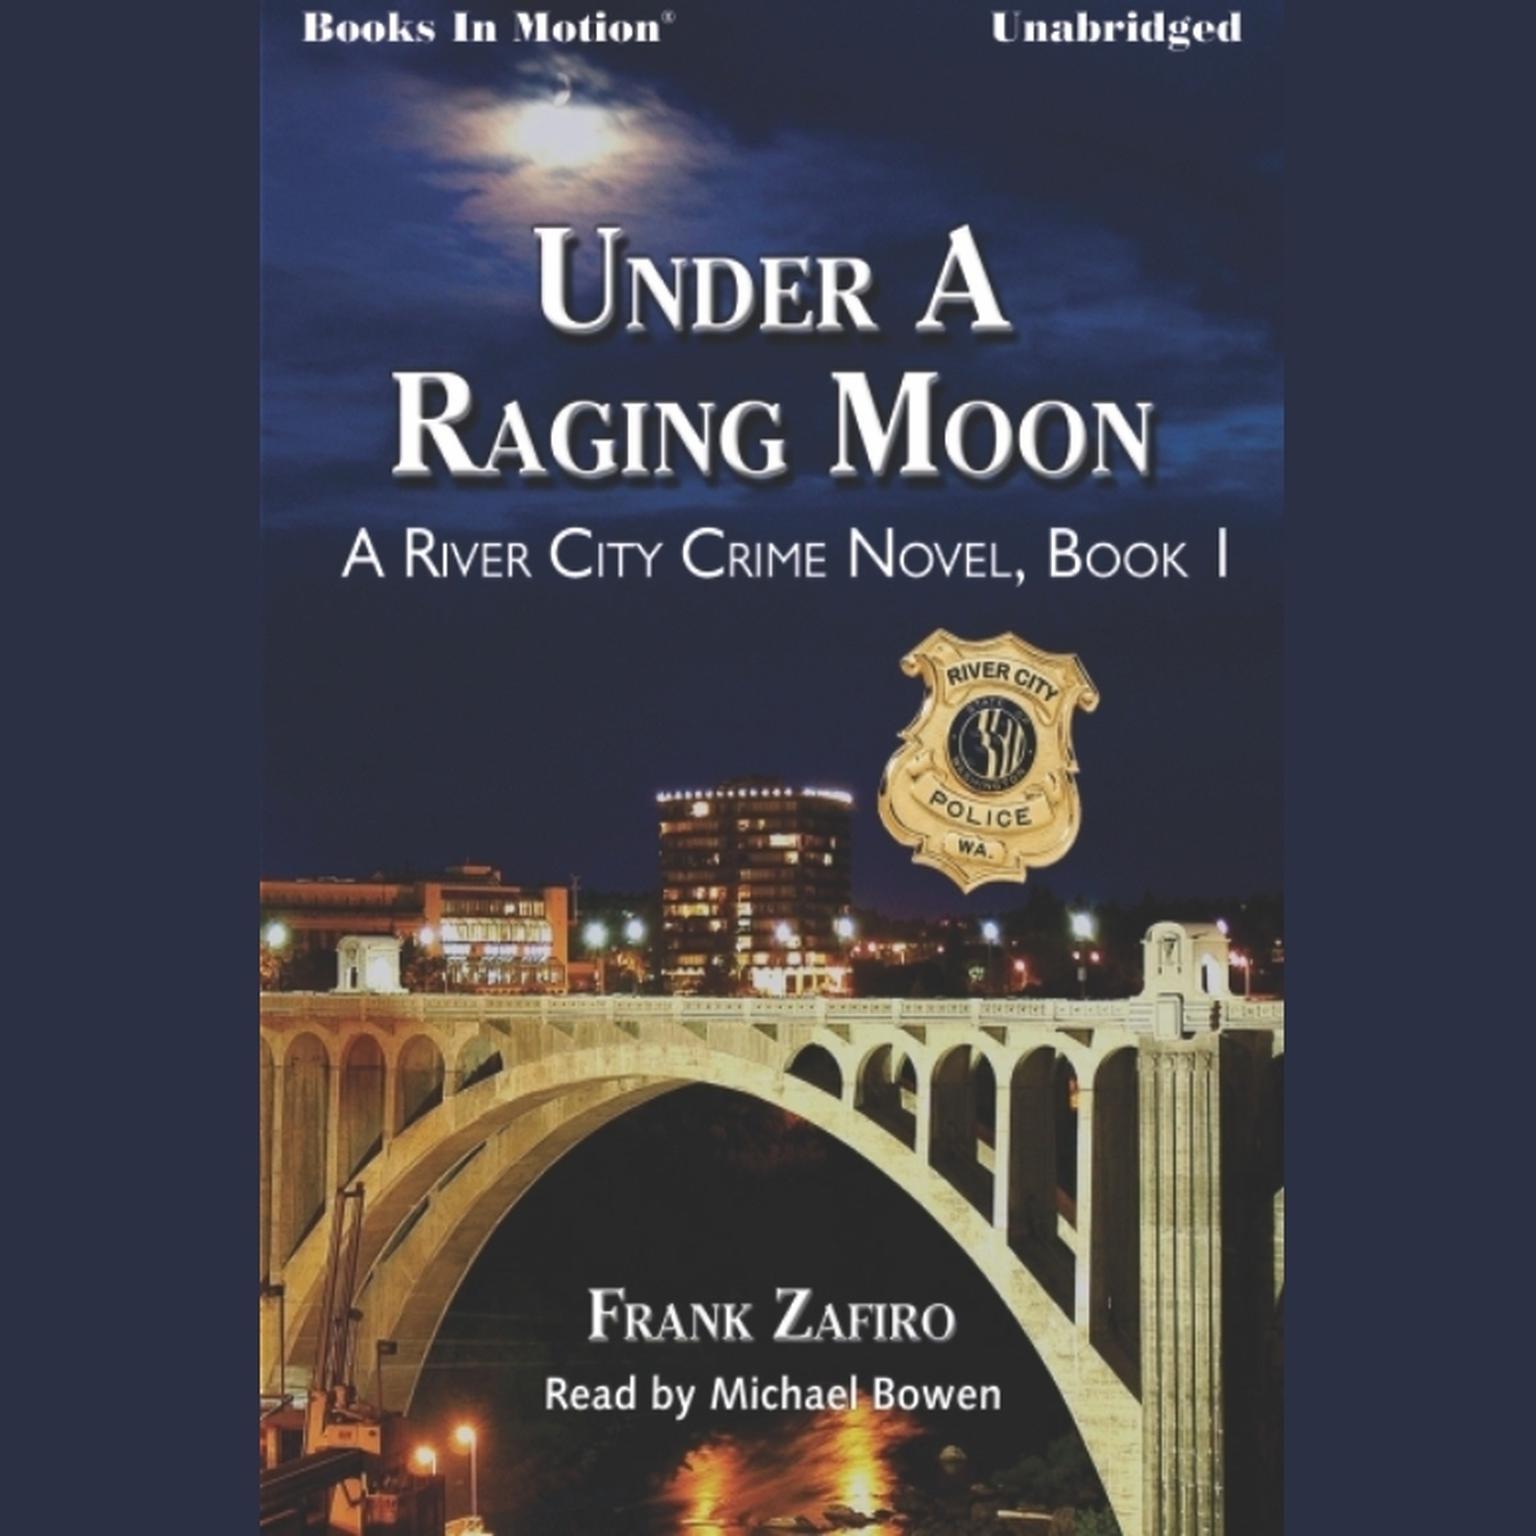 Under A Raging Moon Audiobook, by Frank Zafiro